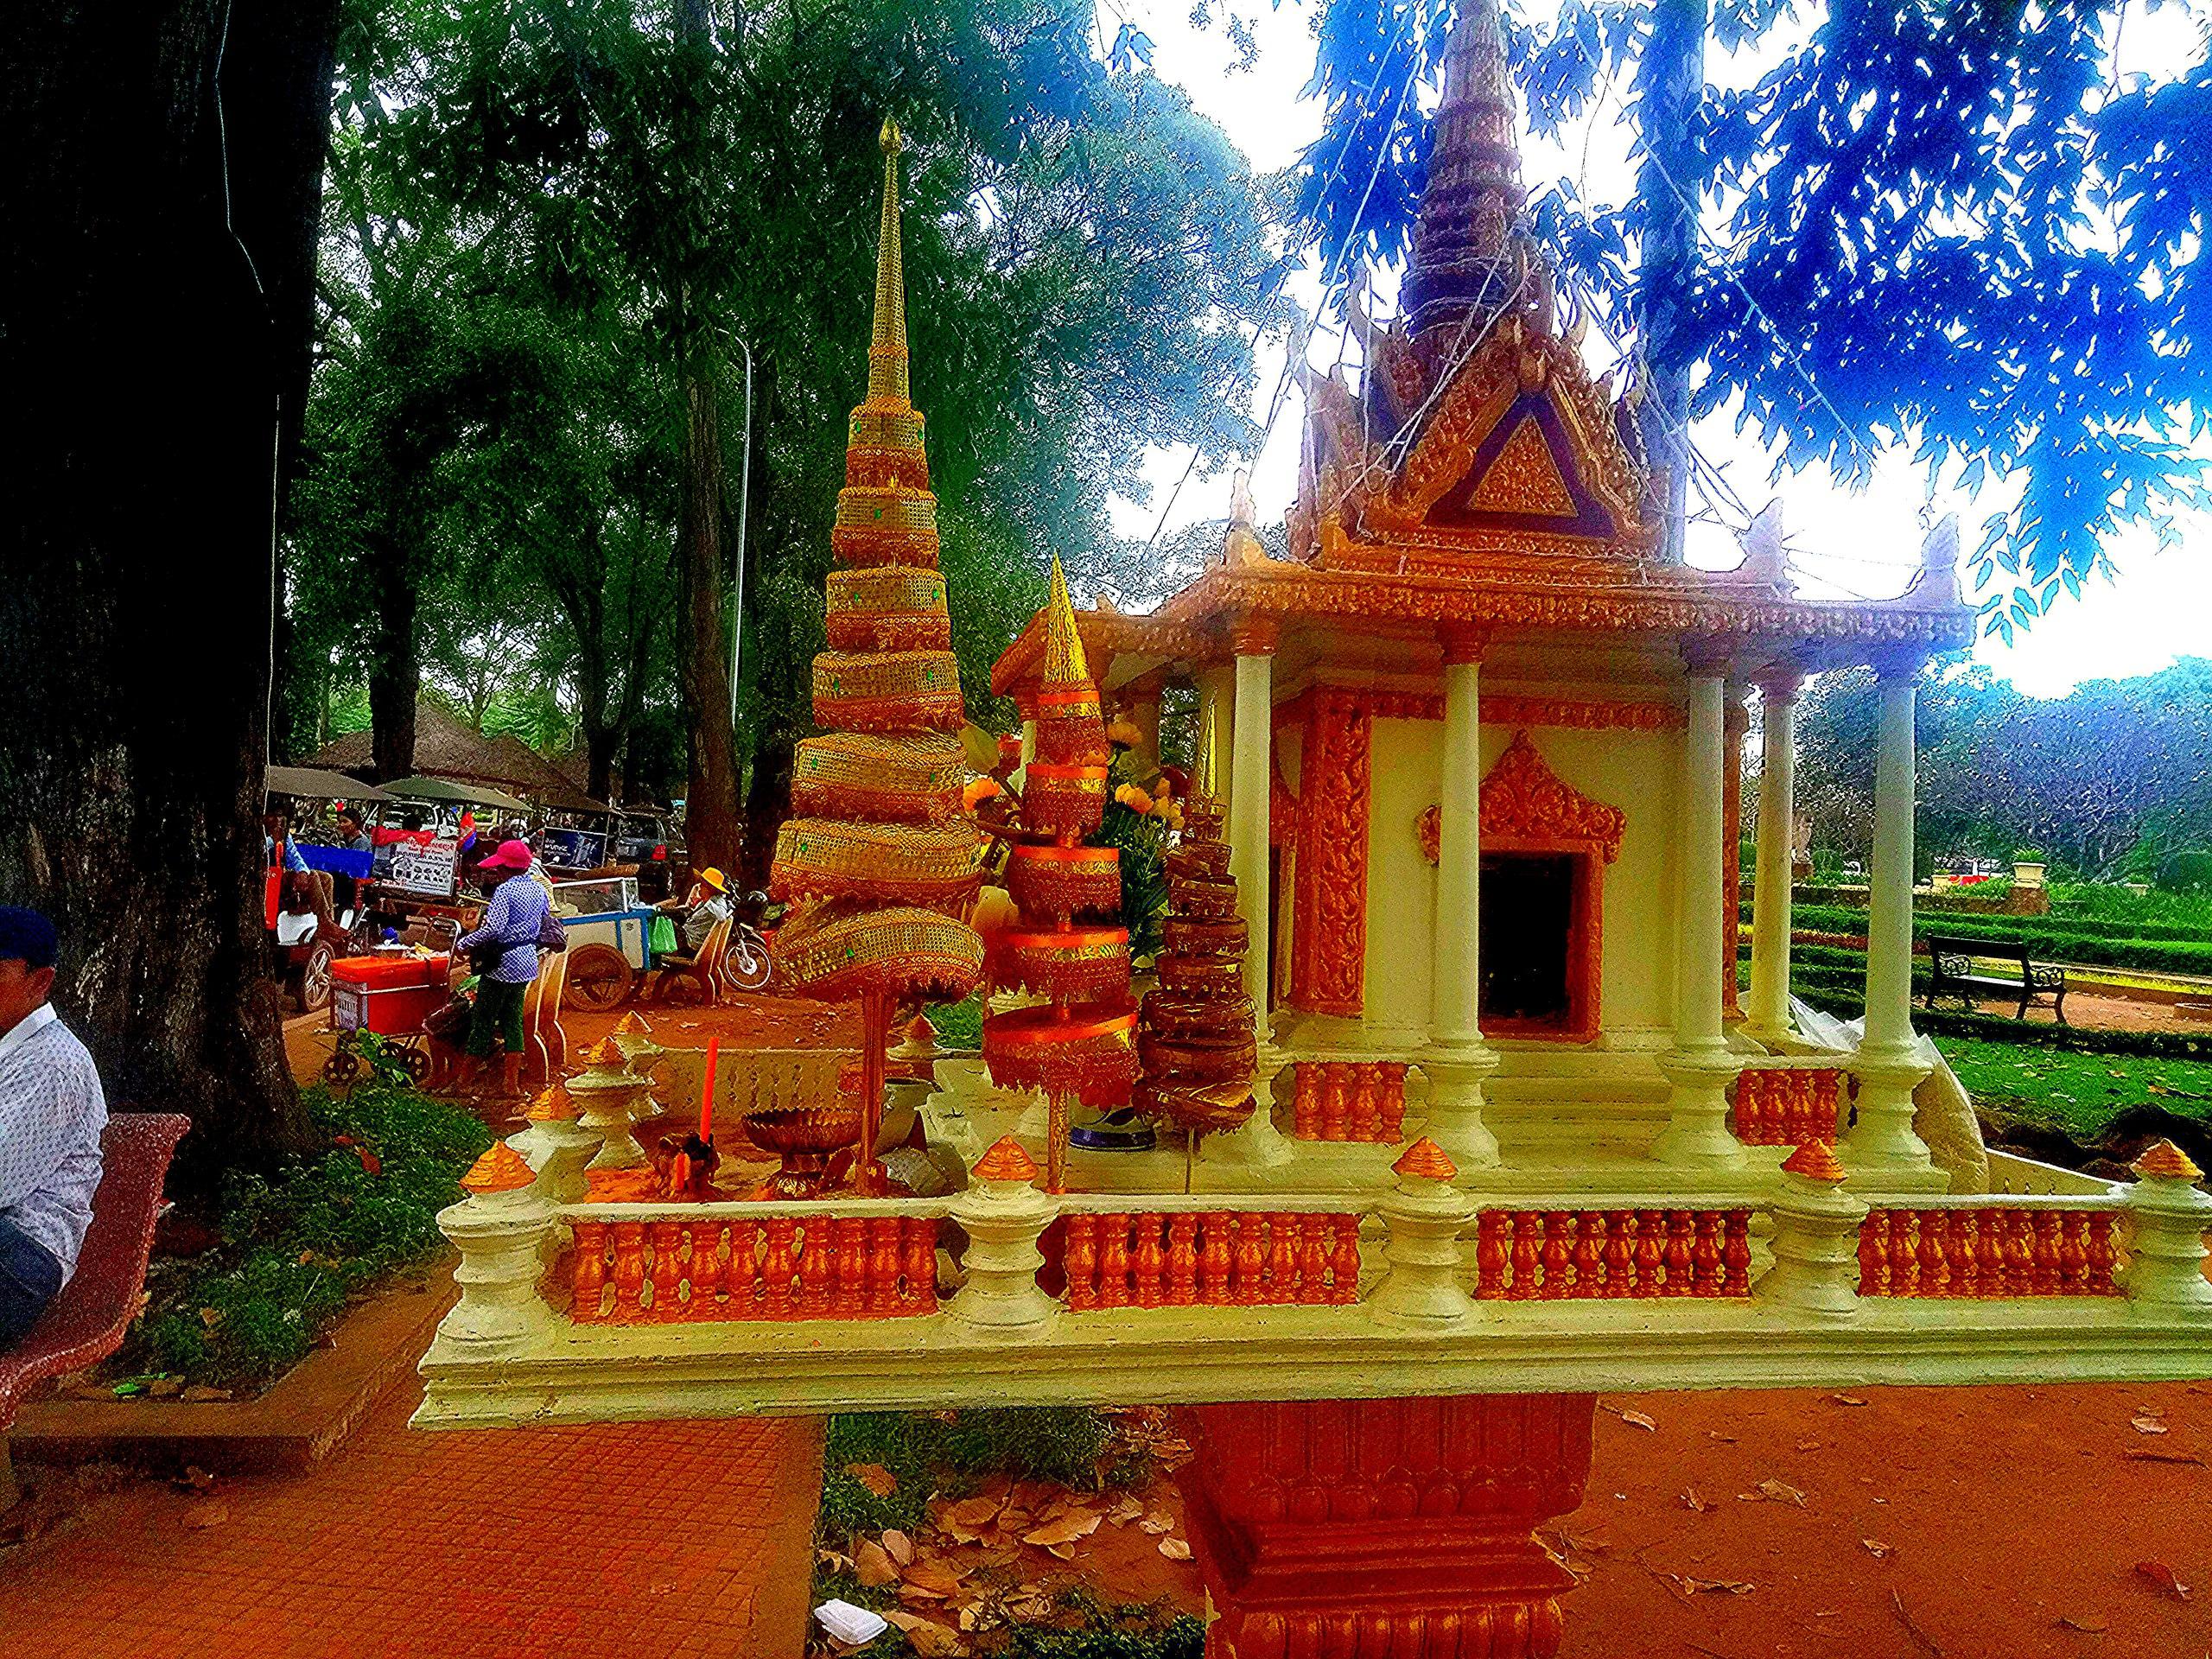 travel - Елена Руденко (Валтея). Камбоджа. Сием Рип. 3dYJzZYj9d0